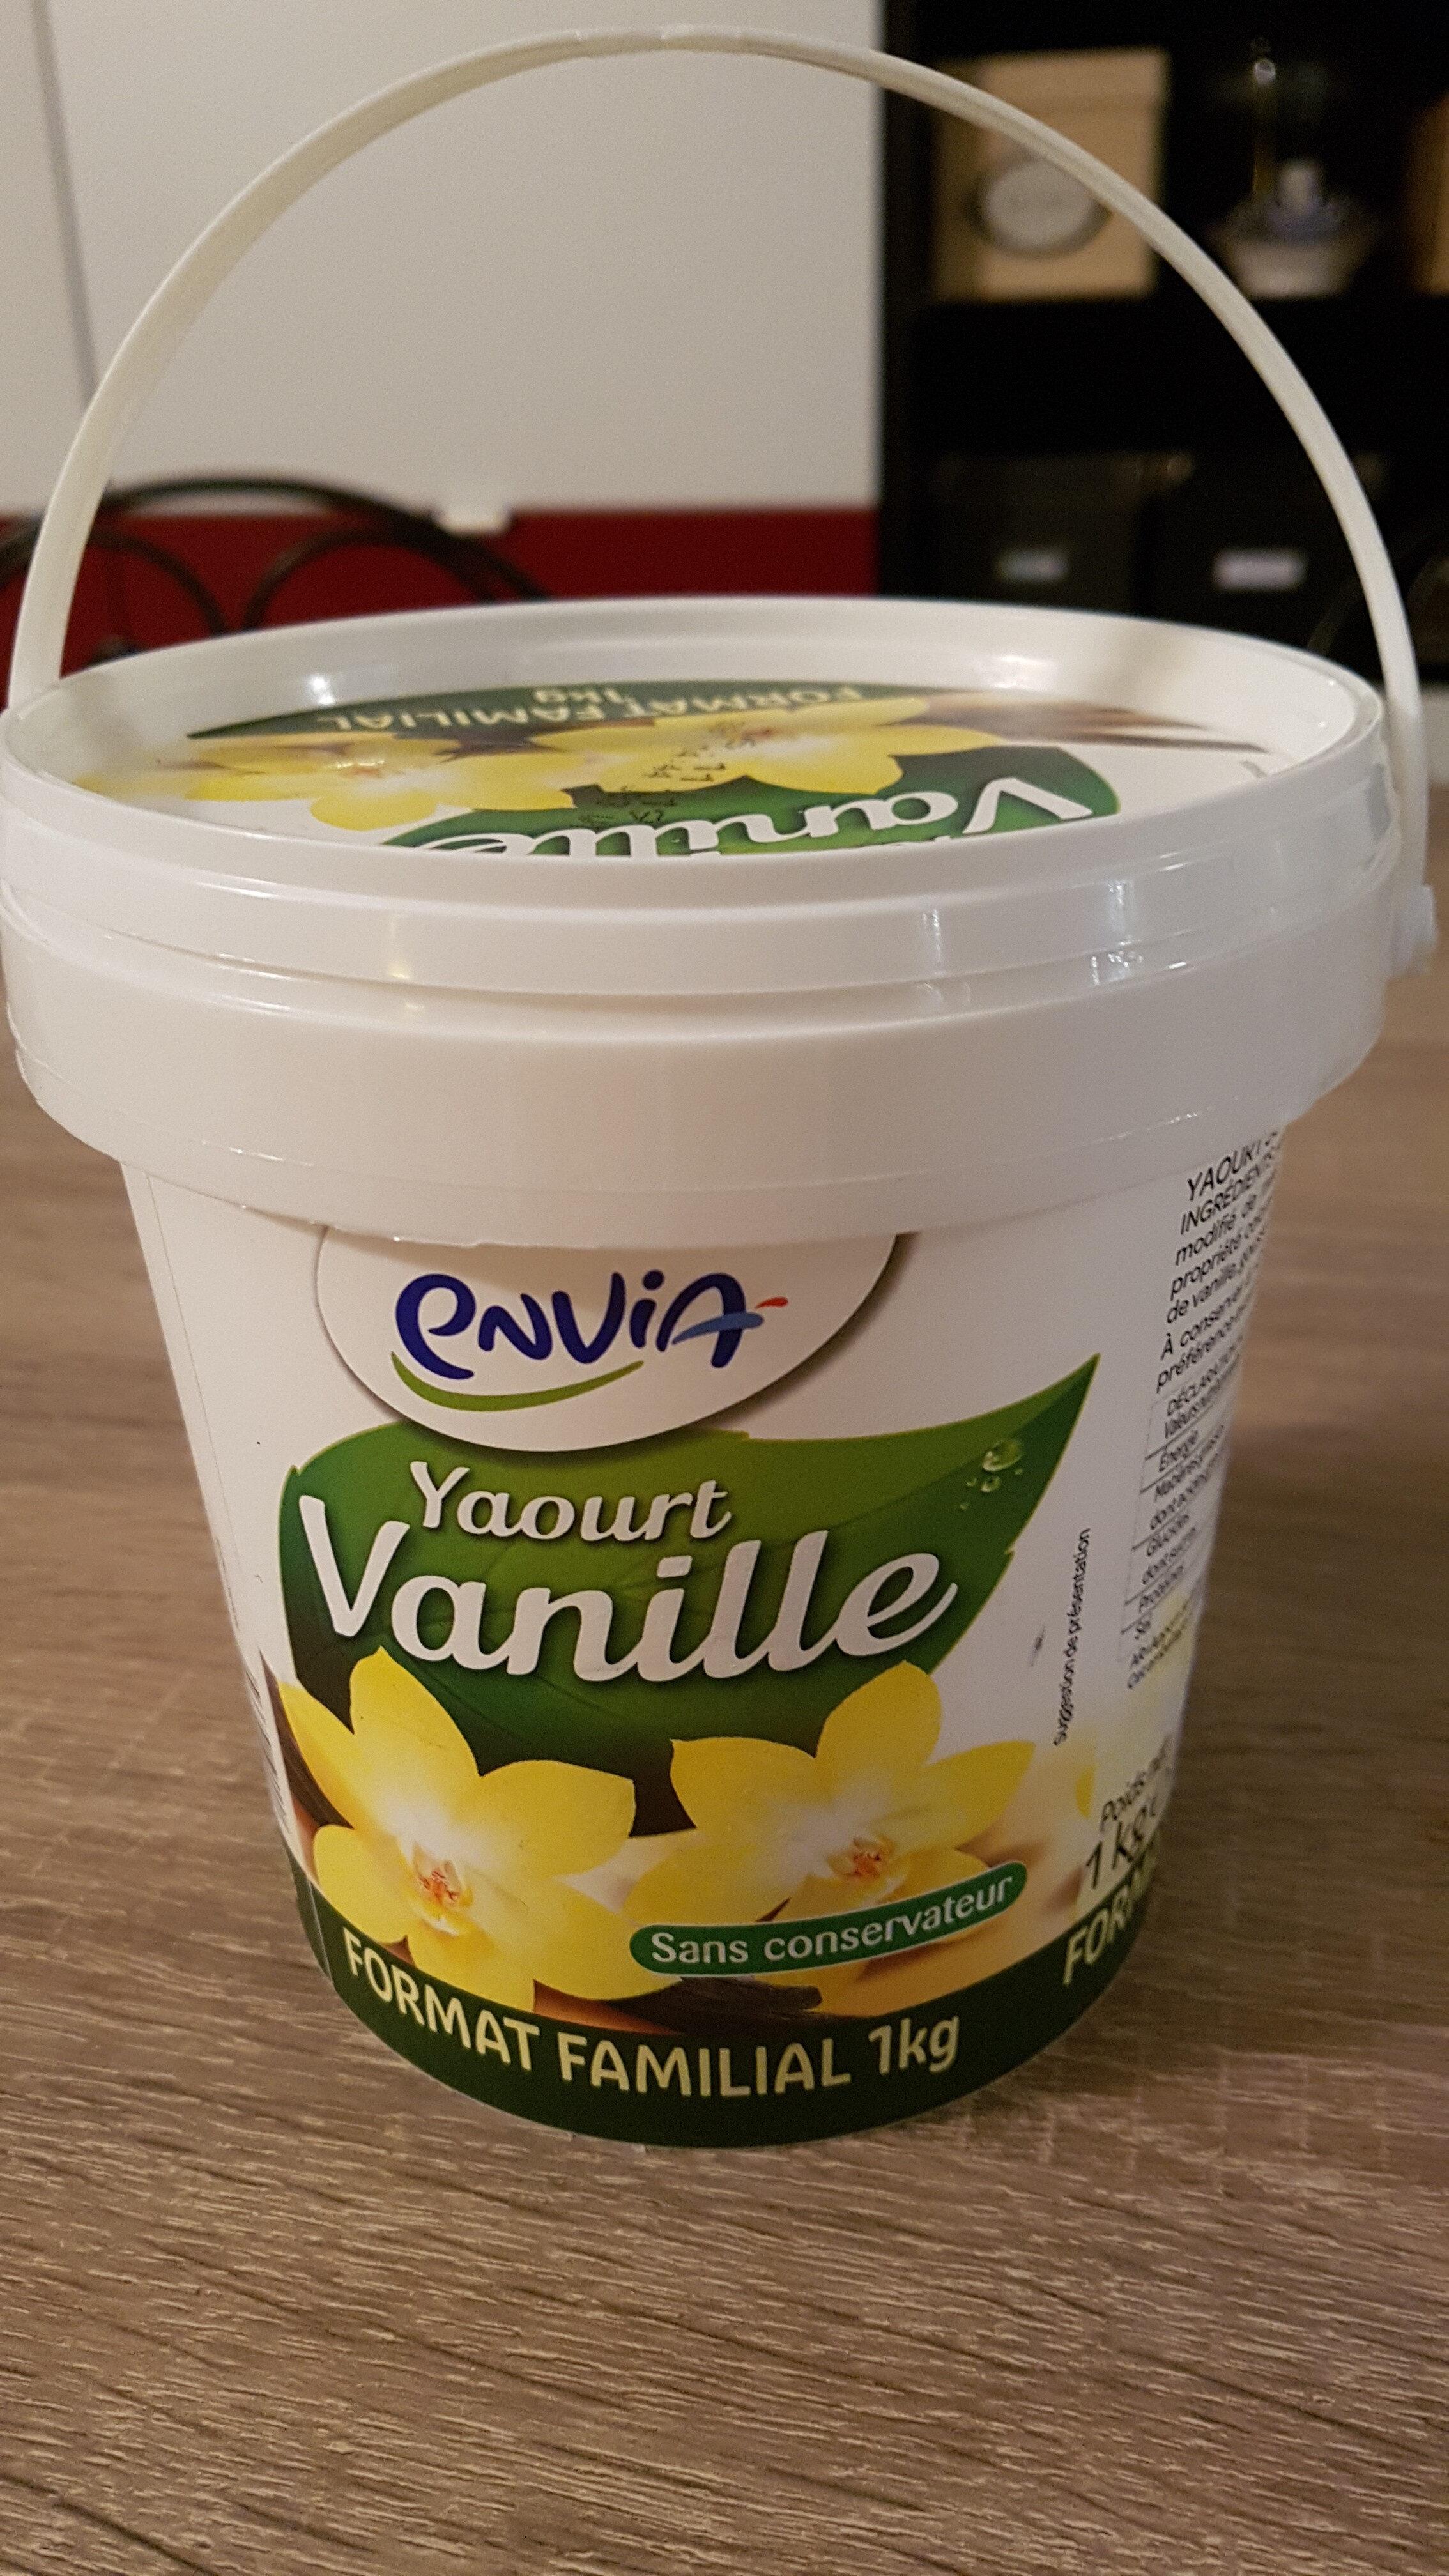 Yaourt Vanille - Product